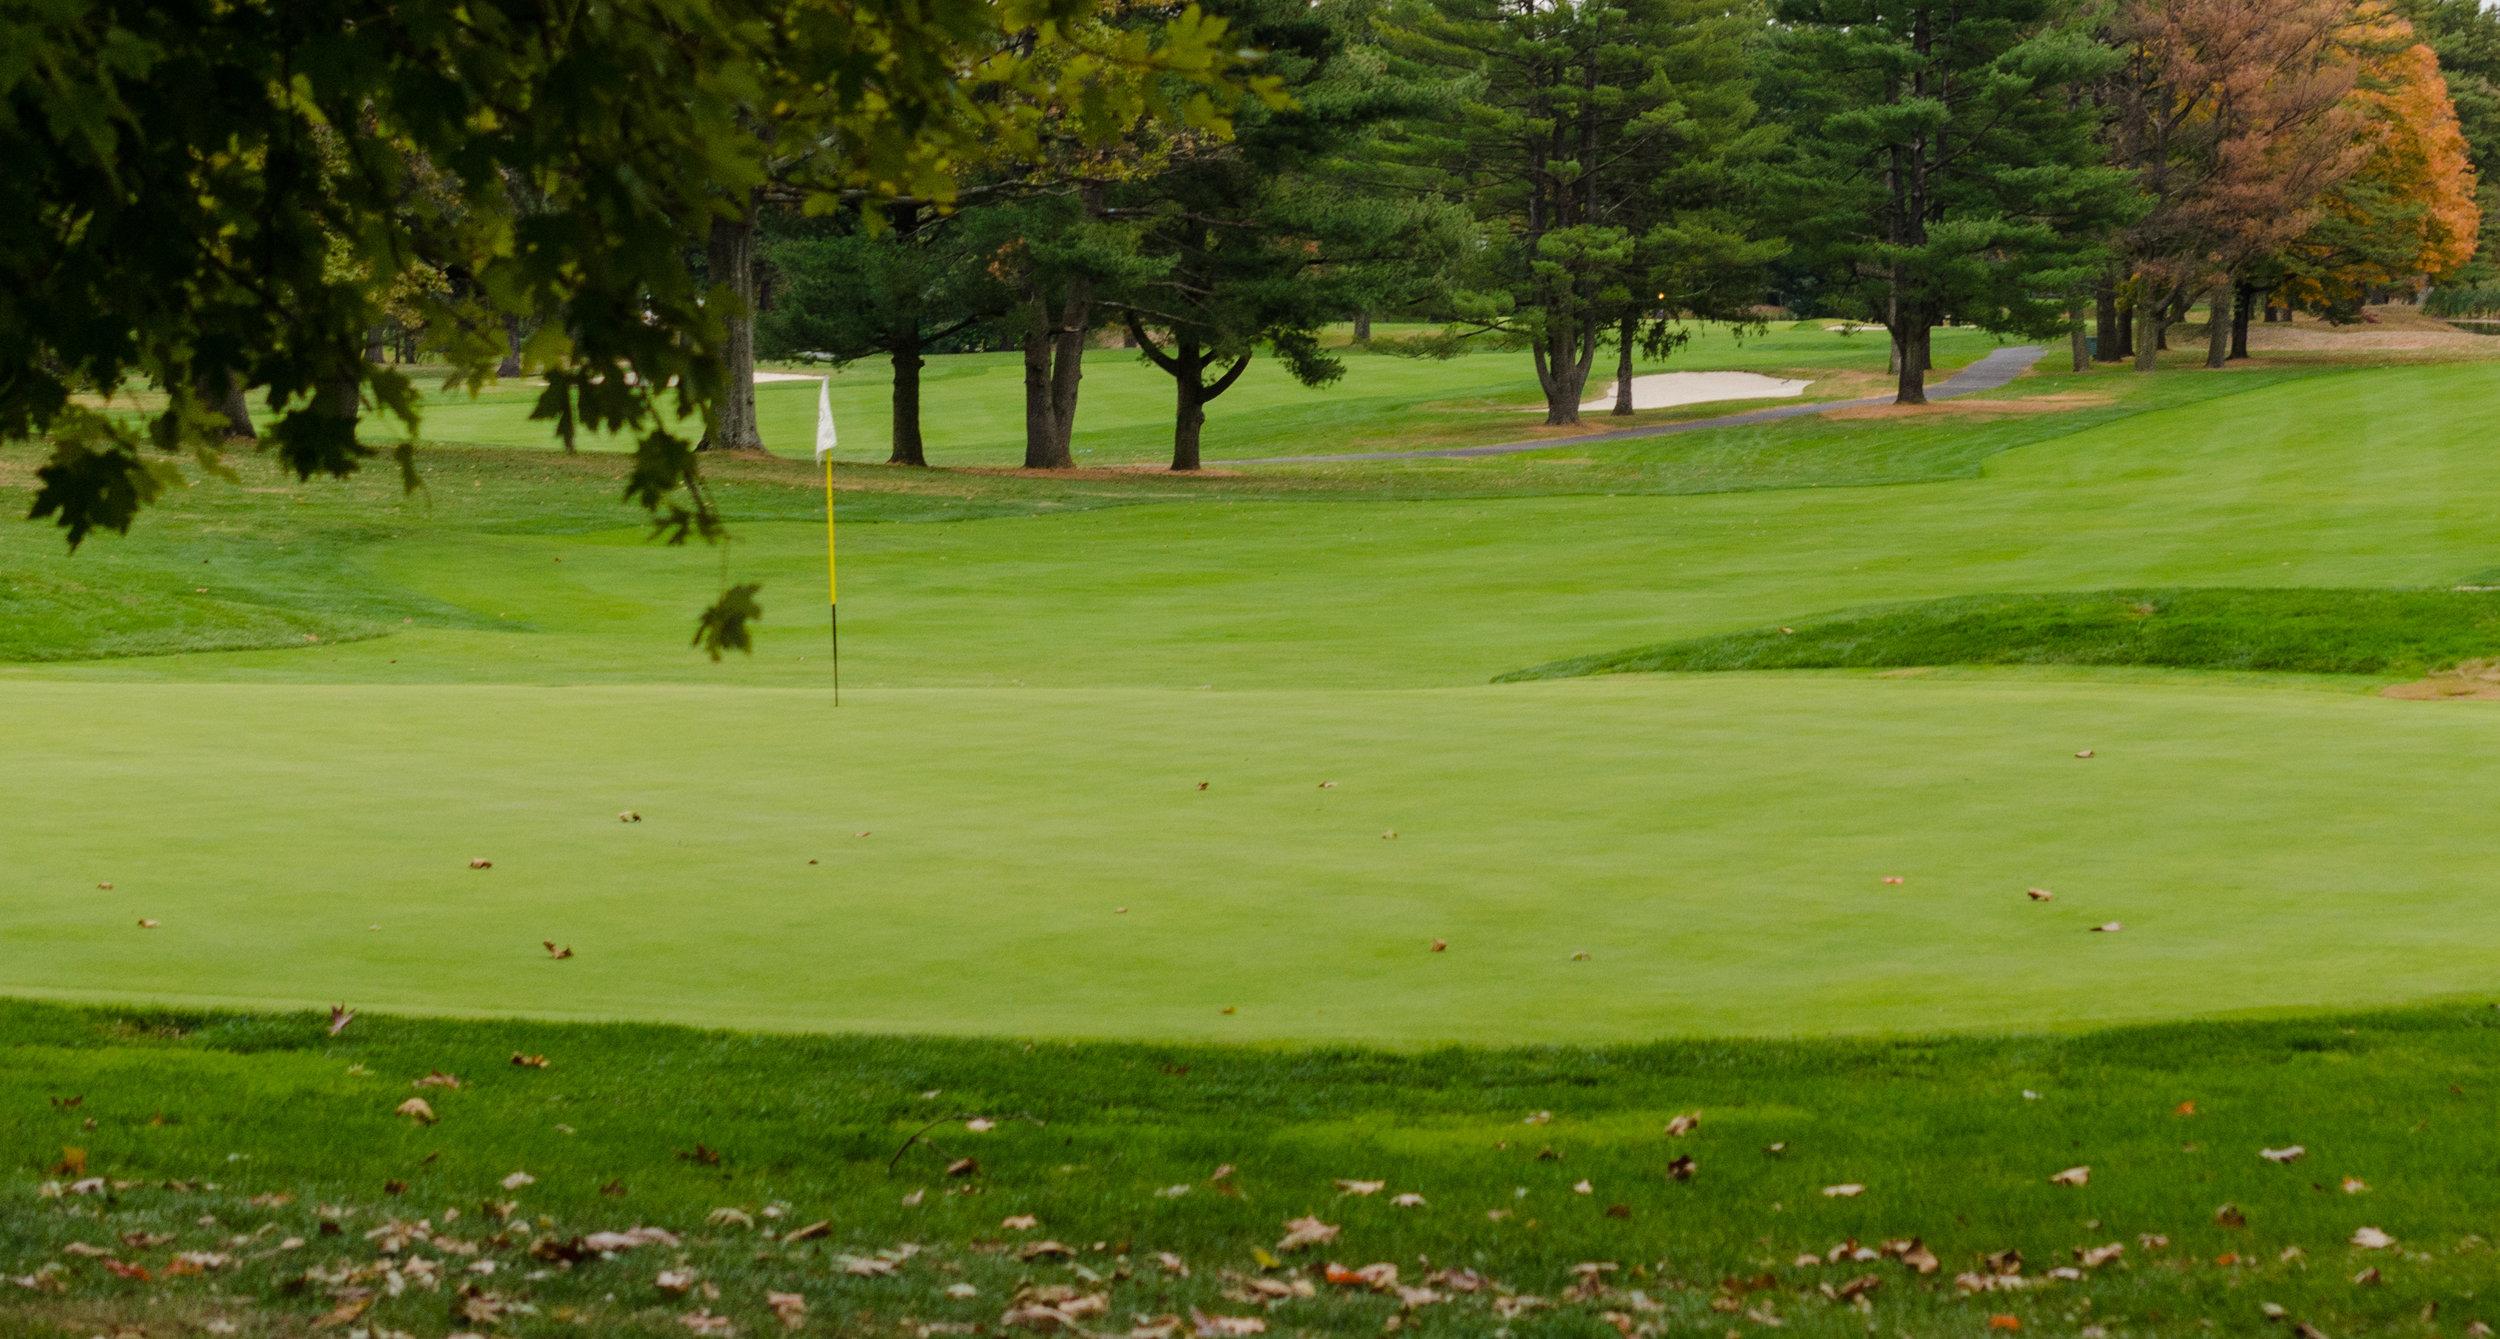 Gambler Ridge Golf Club - Saturday, July 28, 201811:30 AM 7:00 PM